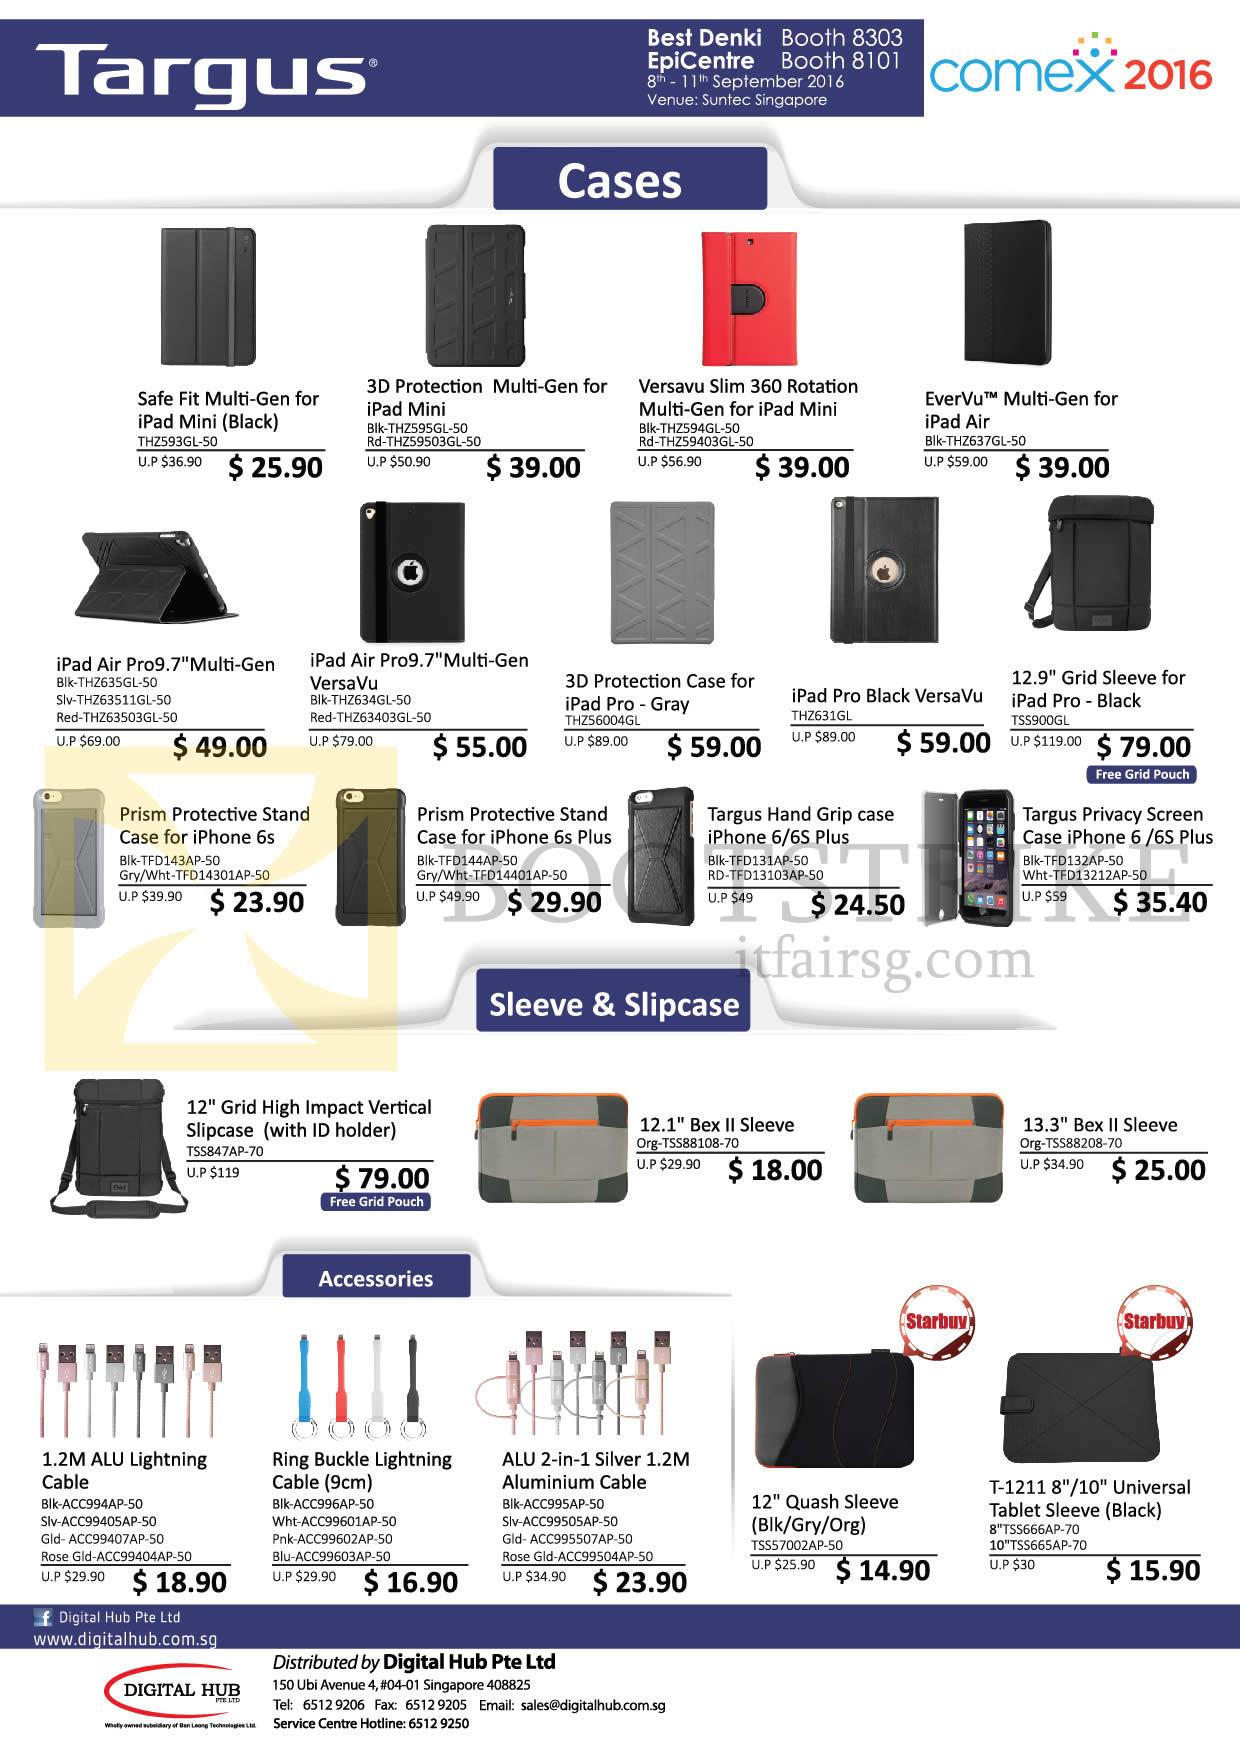 COMEX 2016 price list image brochure of Targus Digital Hub Cases, Sleeve, Slipcase, Accessories, Safe Fit, 3D Protection, Versavu Slim 360, Evervu, Air Pro9 7.0, Bex II Sleeve, ALU Lightning Cable, Quash Sleeve